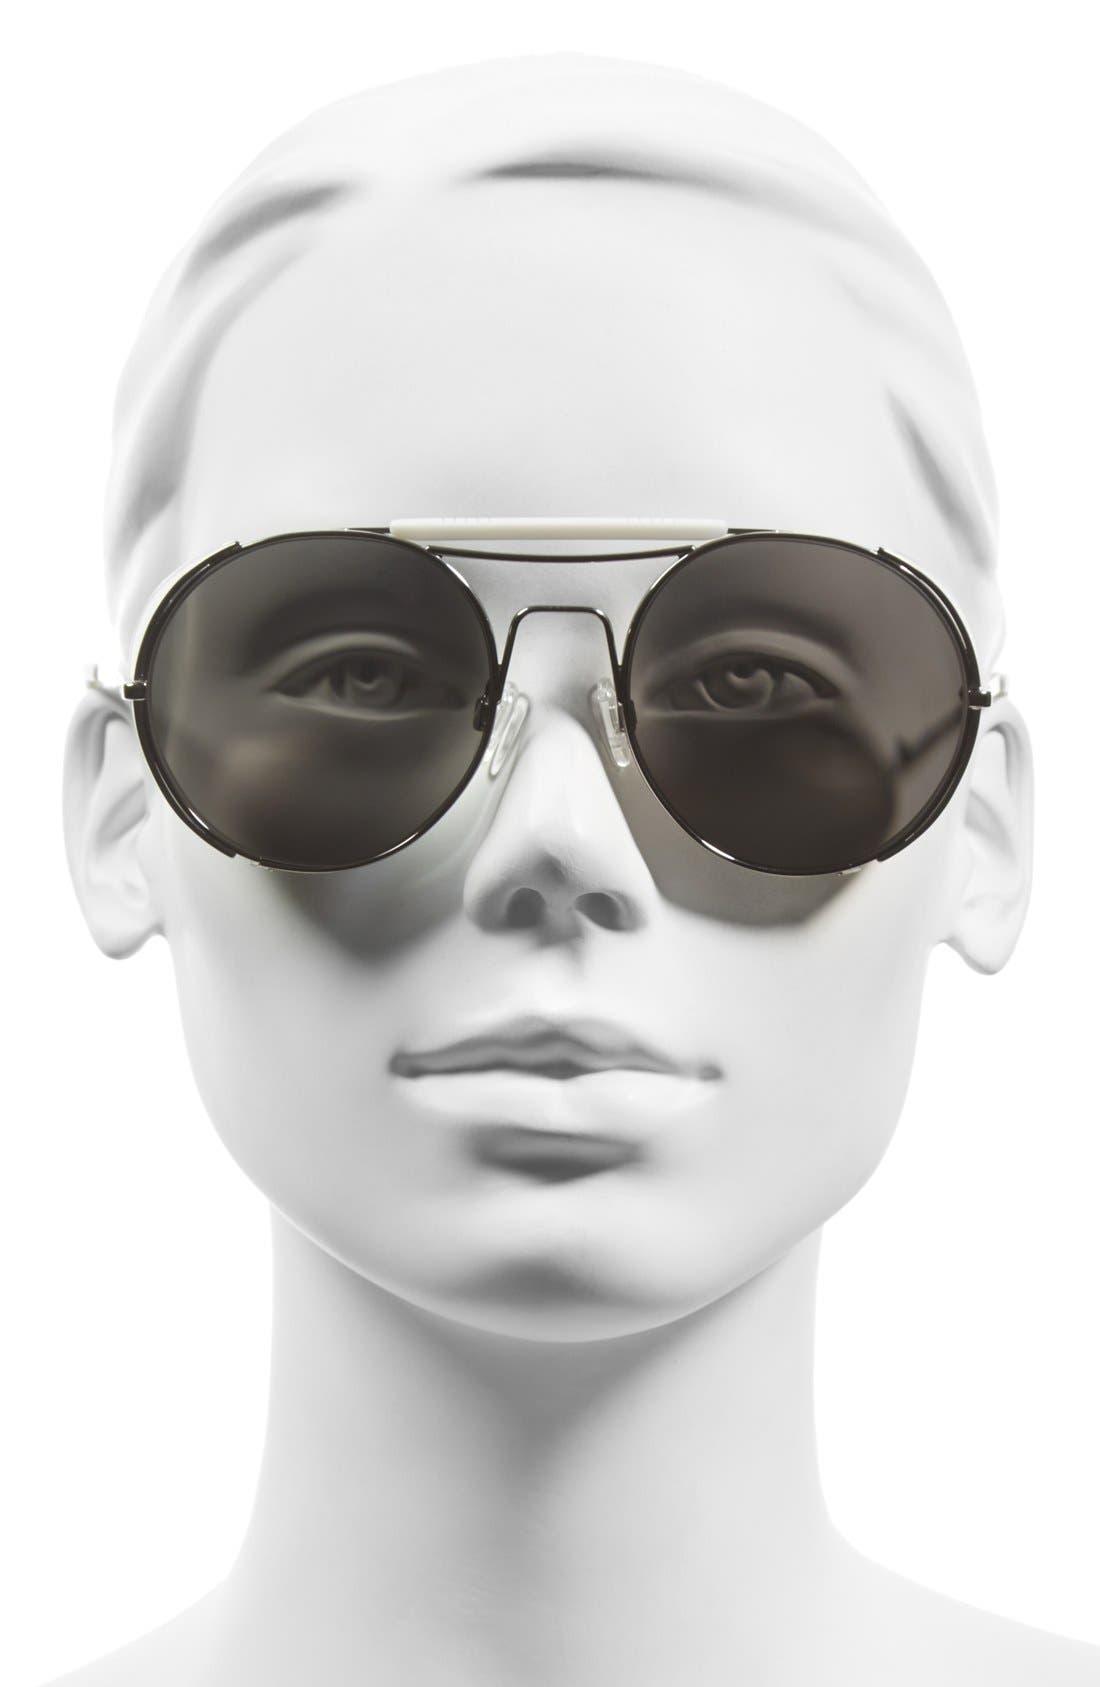 Alternate Image 2  - ill.i by will.i.am 'WA508S' 55mm Sunglasses